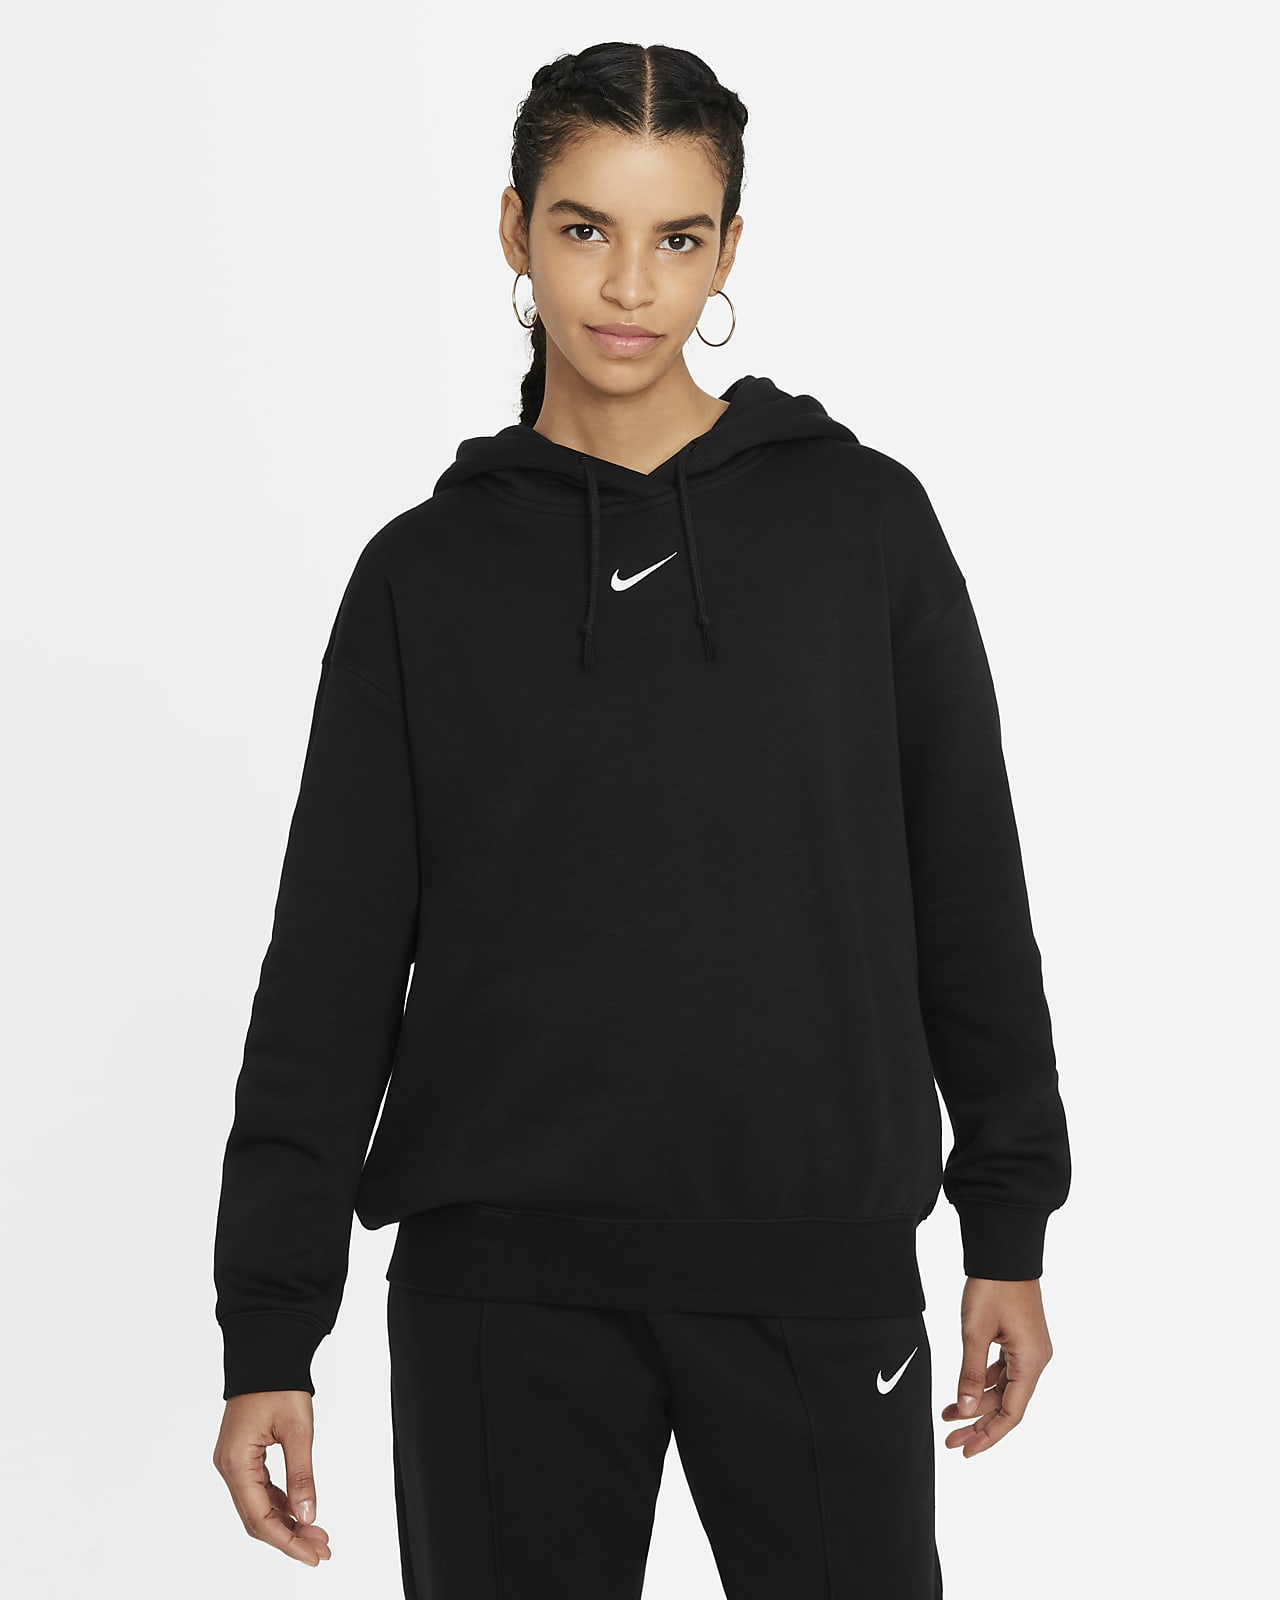 Hoodie folgado de lã cardada Nike Sportswear Essential Collection para mulher